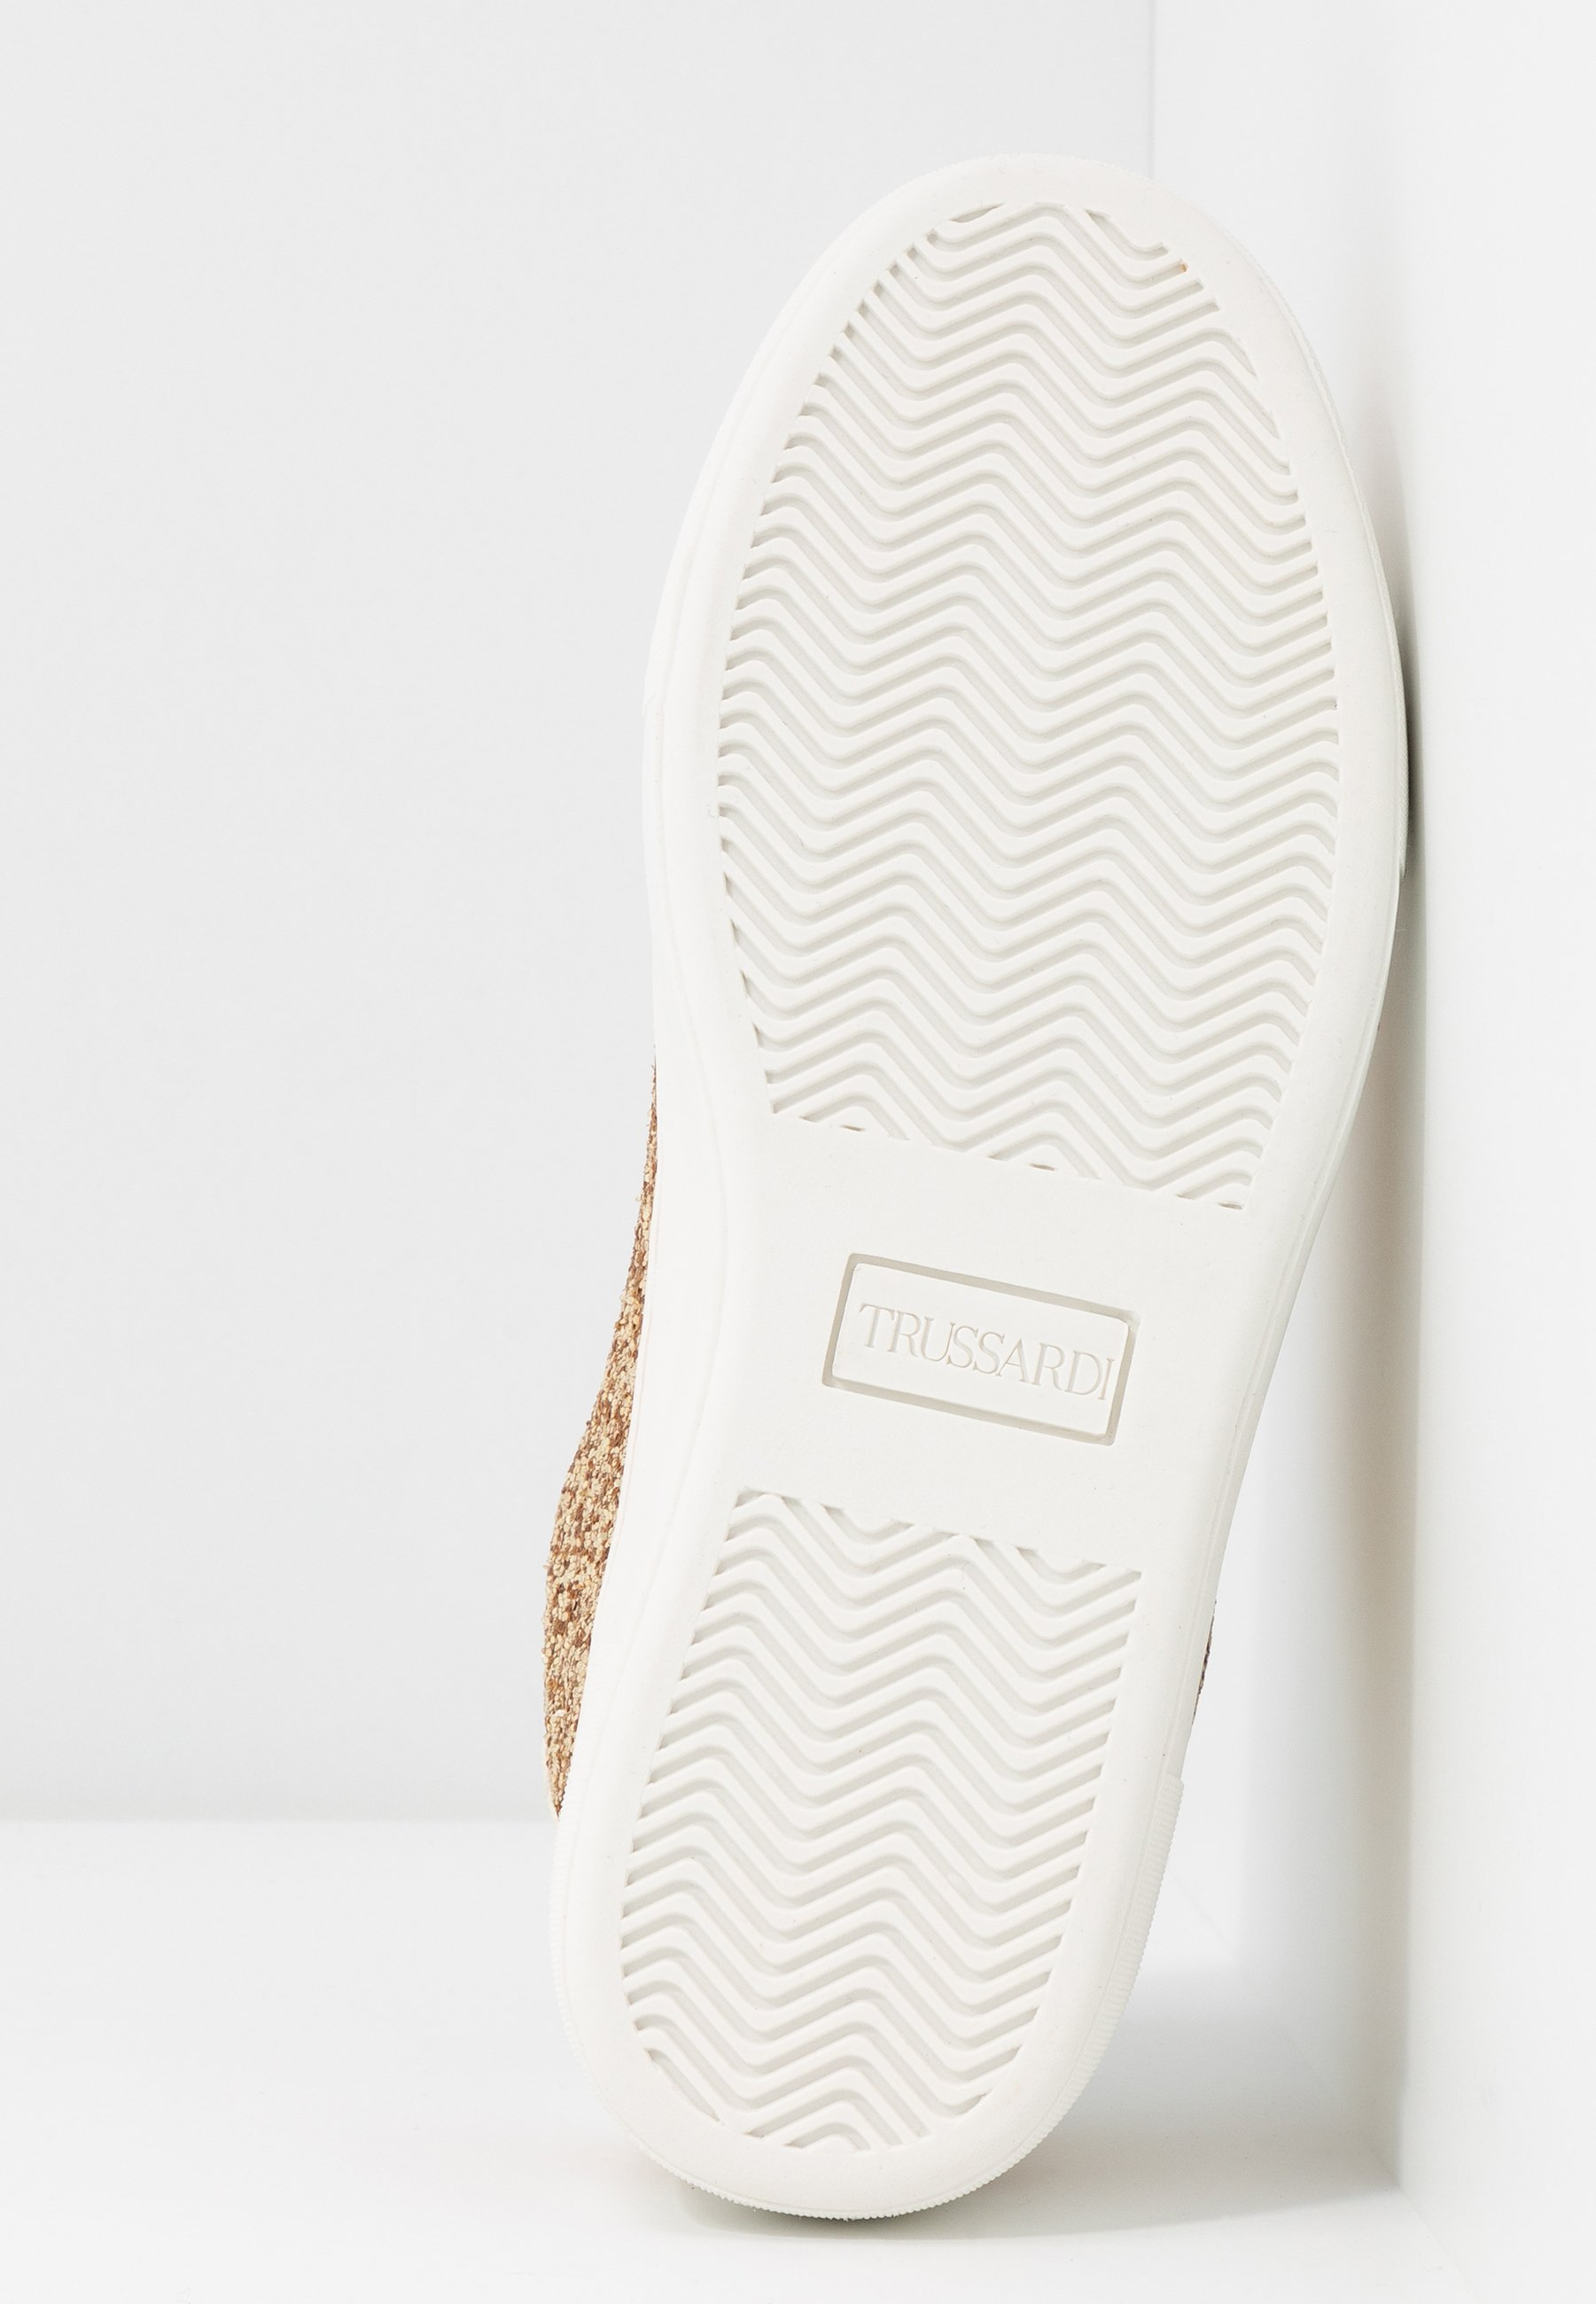 Trussardi Jeans Sneakers - Gold